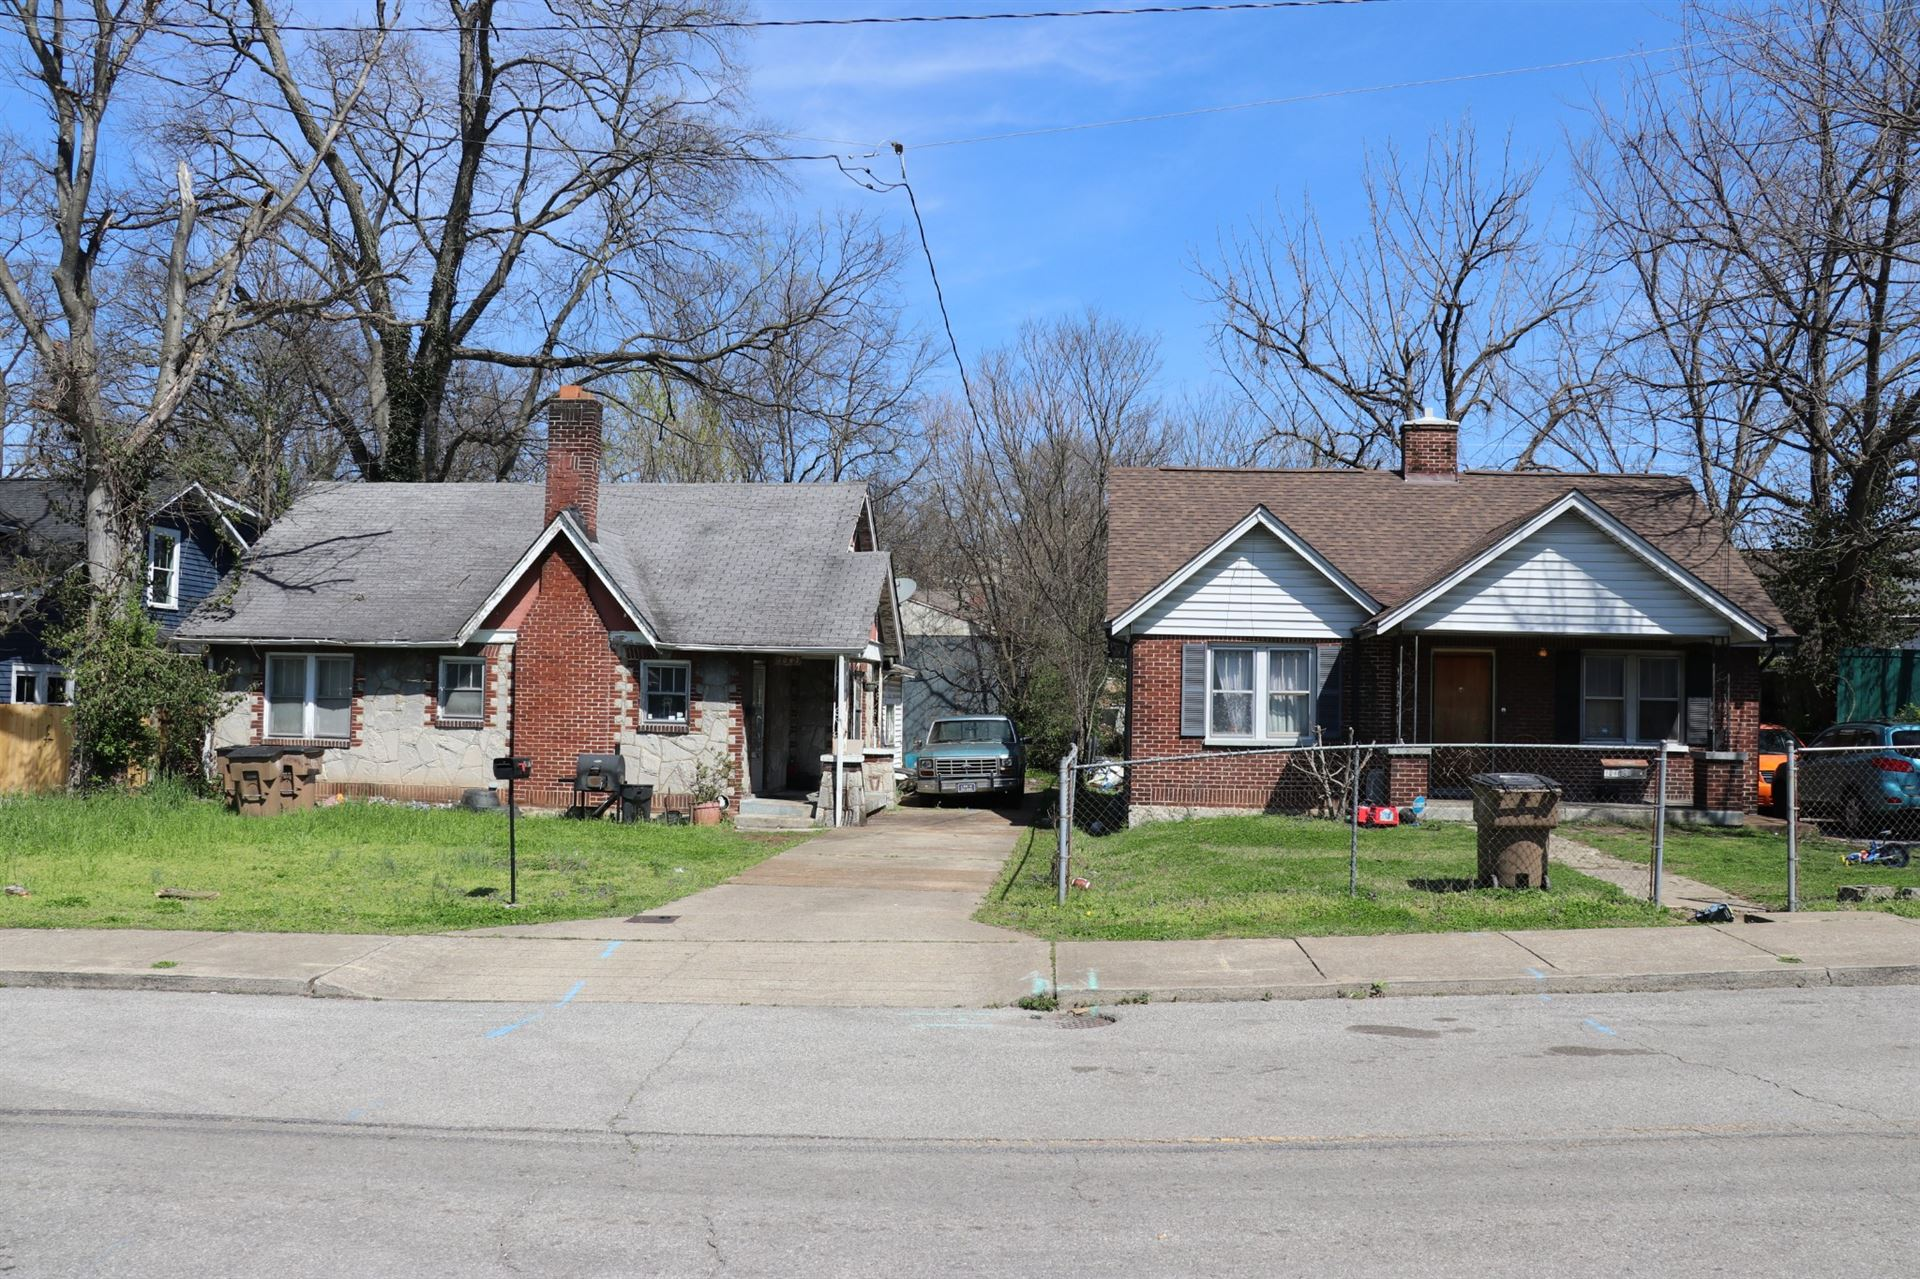 Photo of 1049 Sharpe Ave, Nashville, TN 37206 (MLS # 2244443)